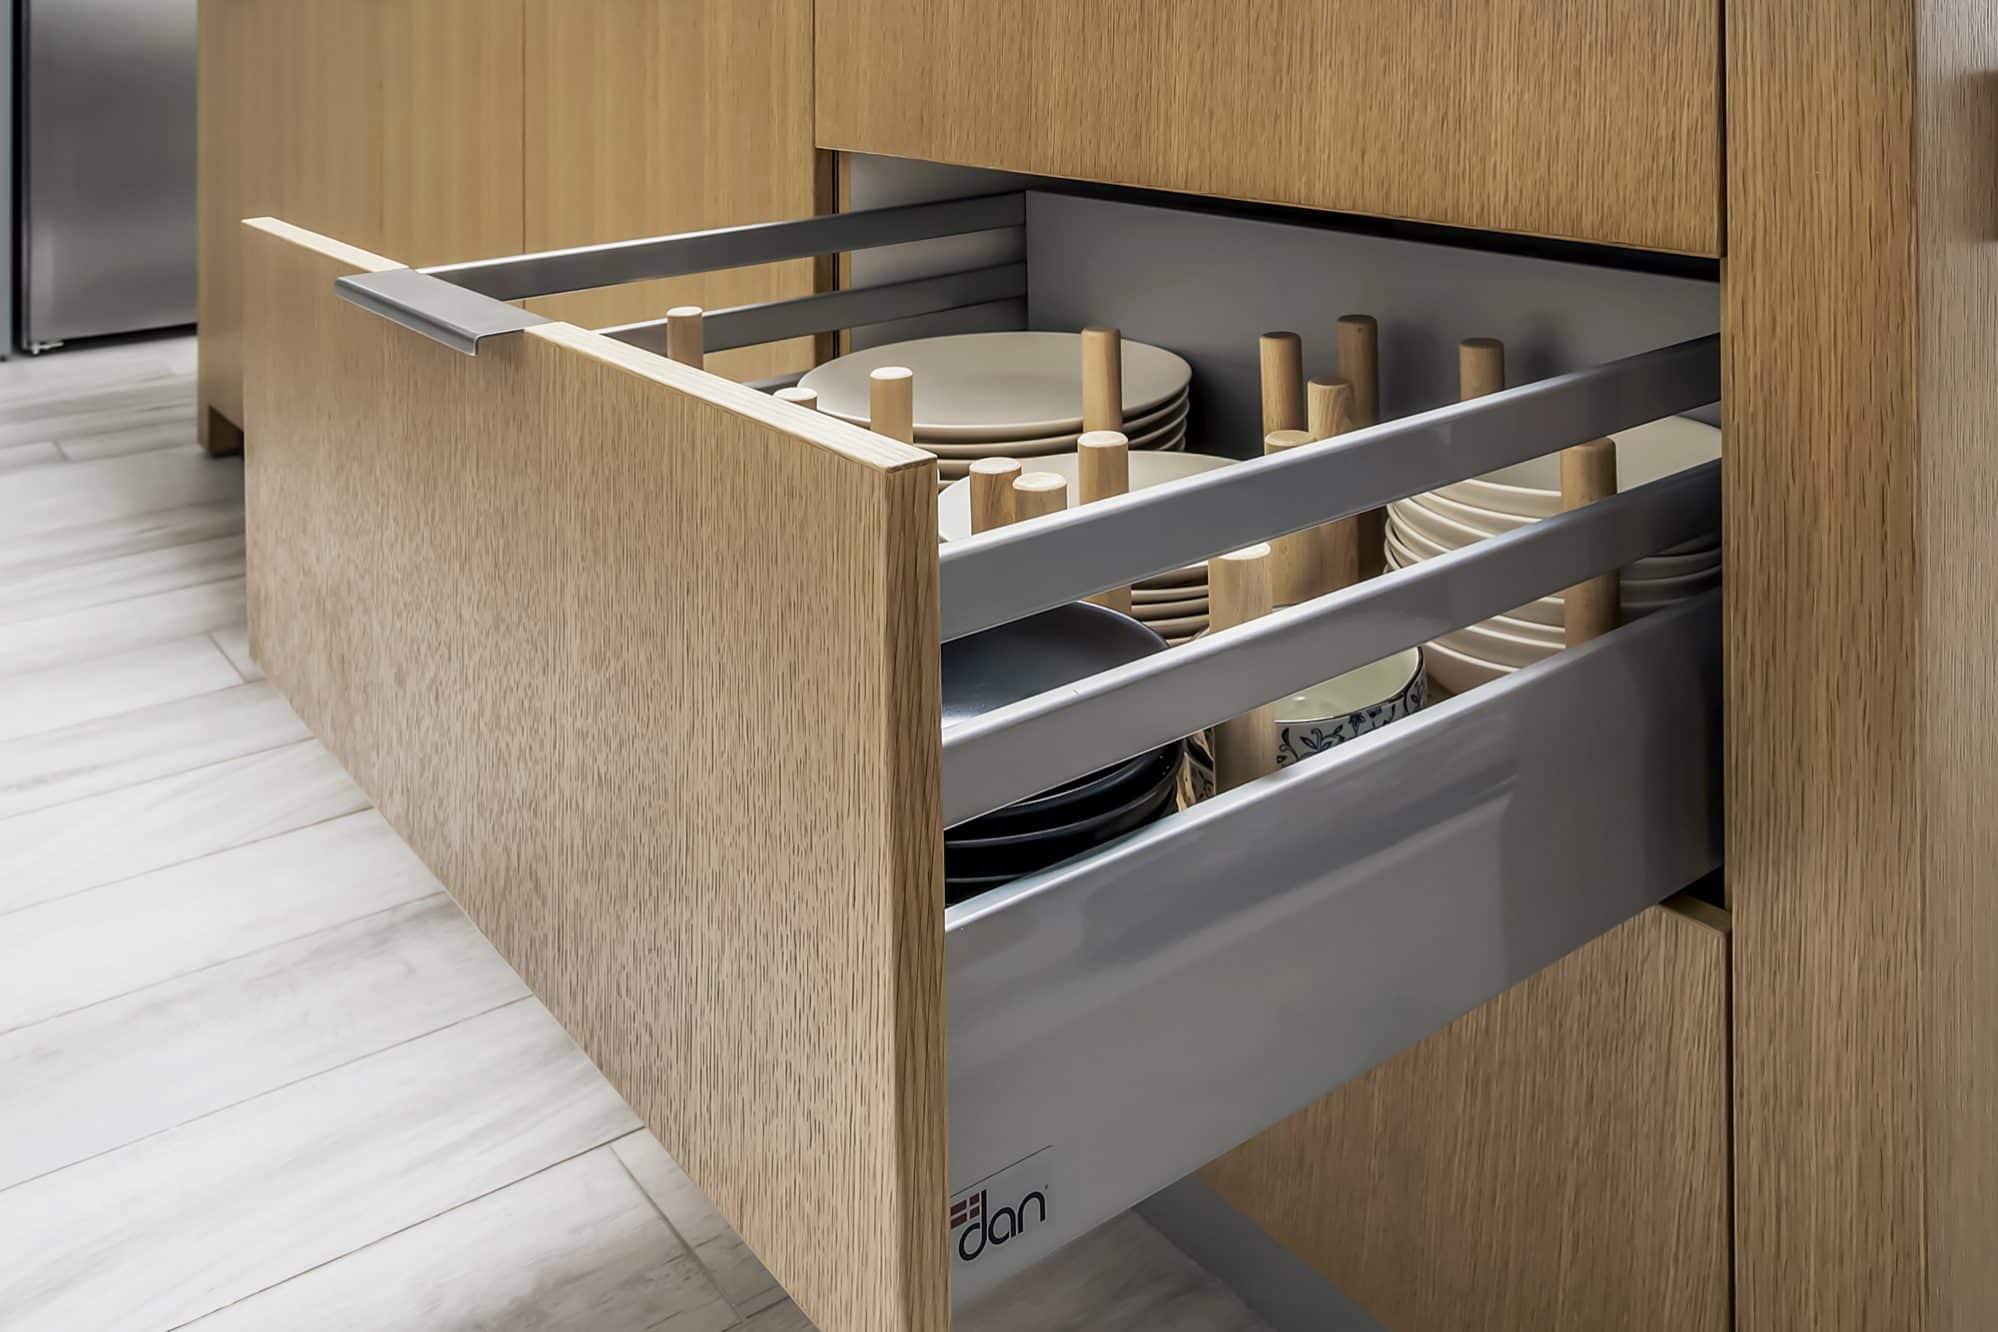 American Oak drawers